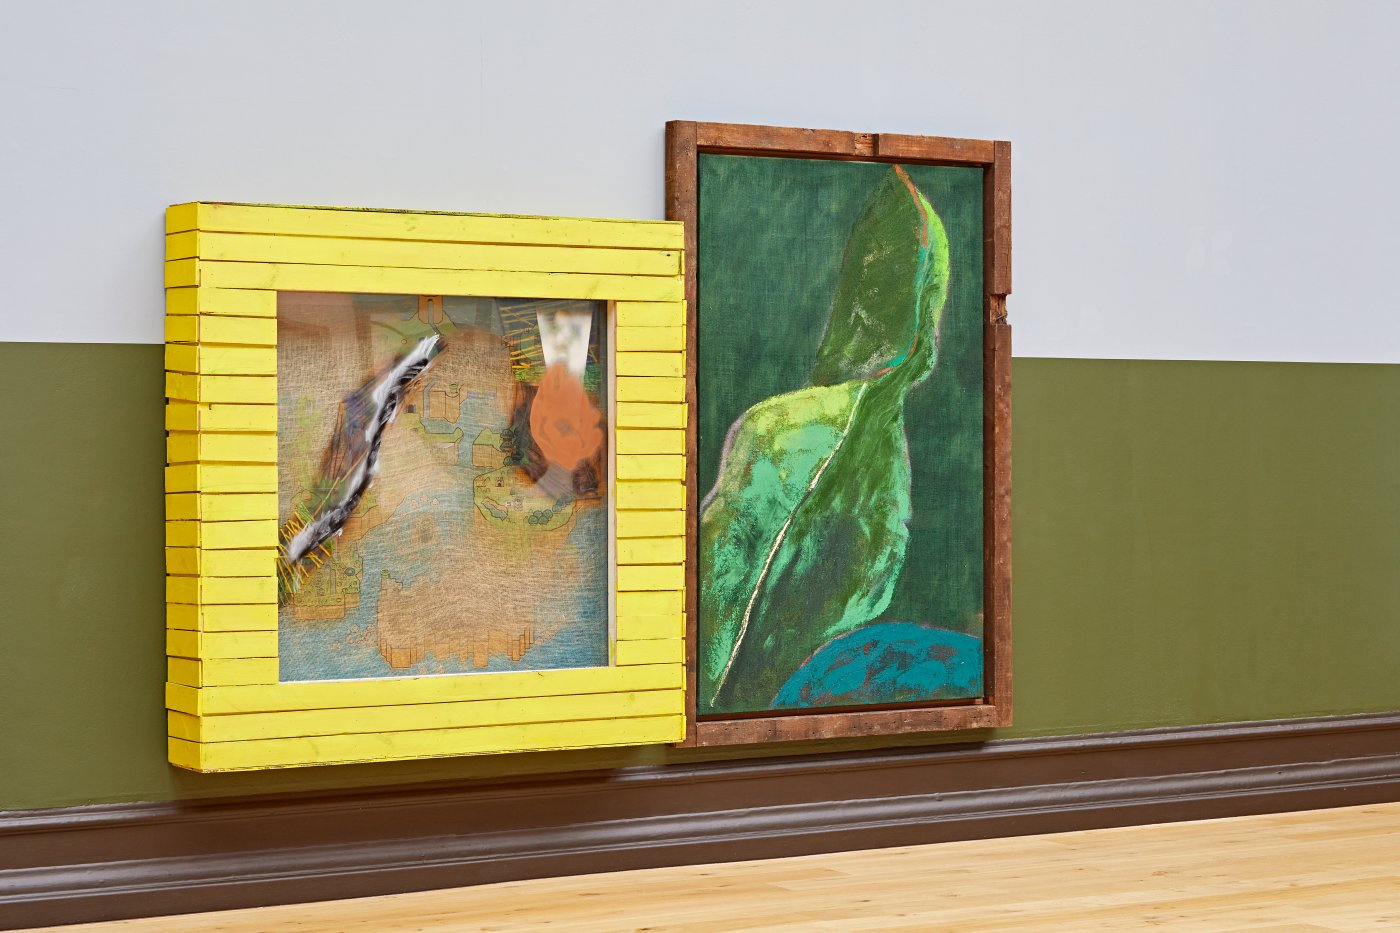 South London Gallery Alvaro Barrington 2